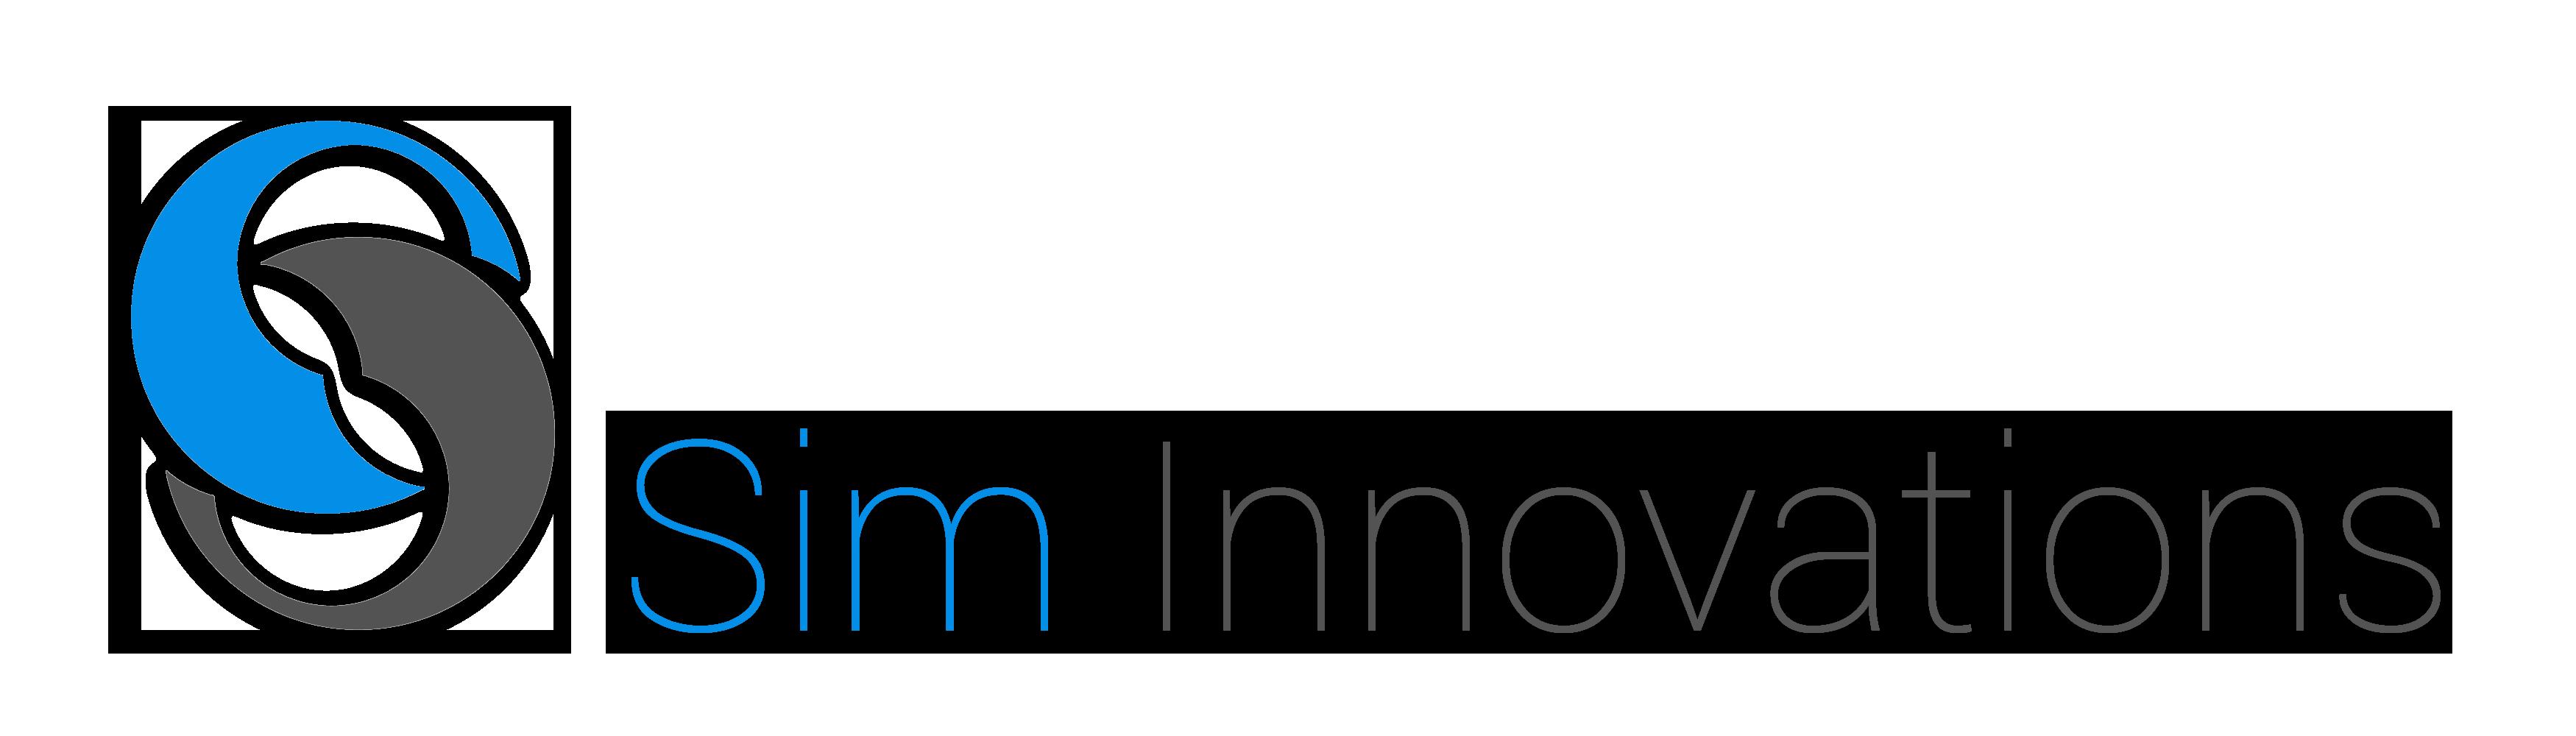 "[""Sim Innovations""]"